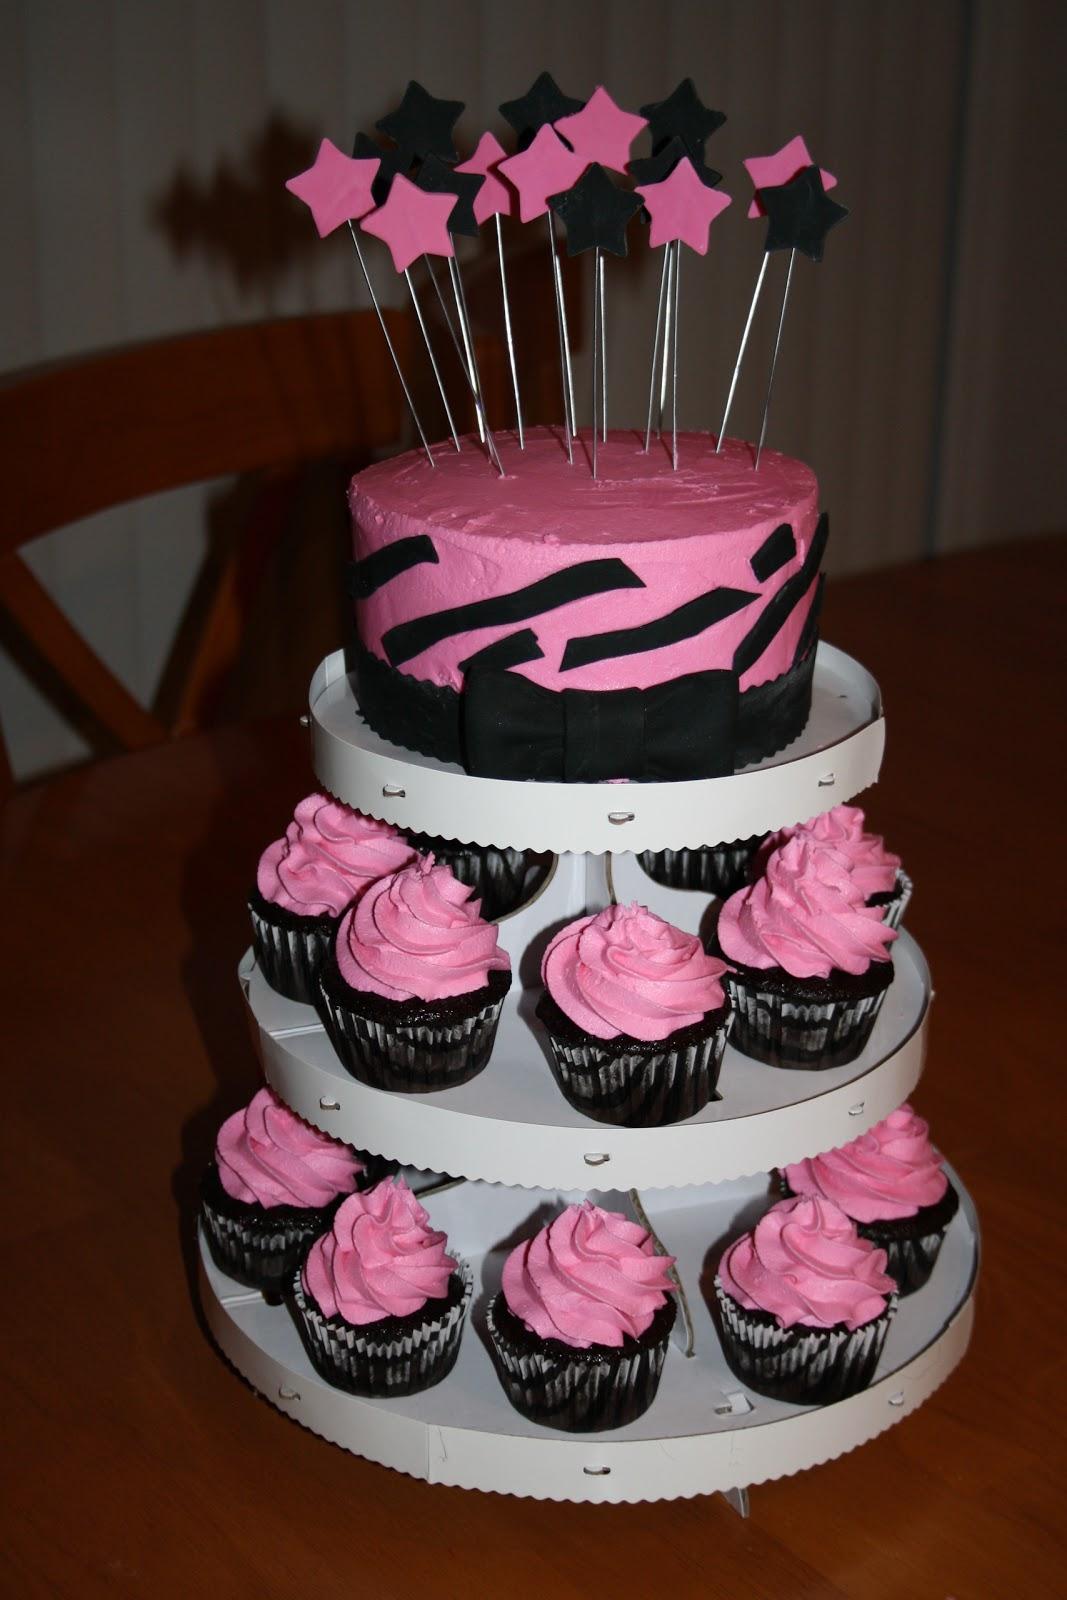 Cupcake Decorating Ideas Pink And Black : JillyCakes: Black & Pink Zebra Birthday Cake/Cupcakes!